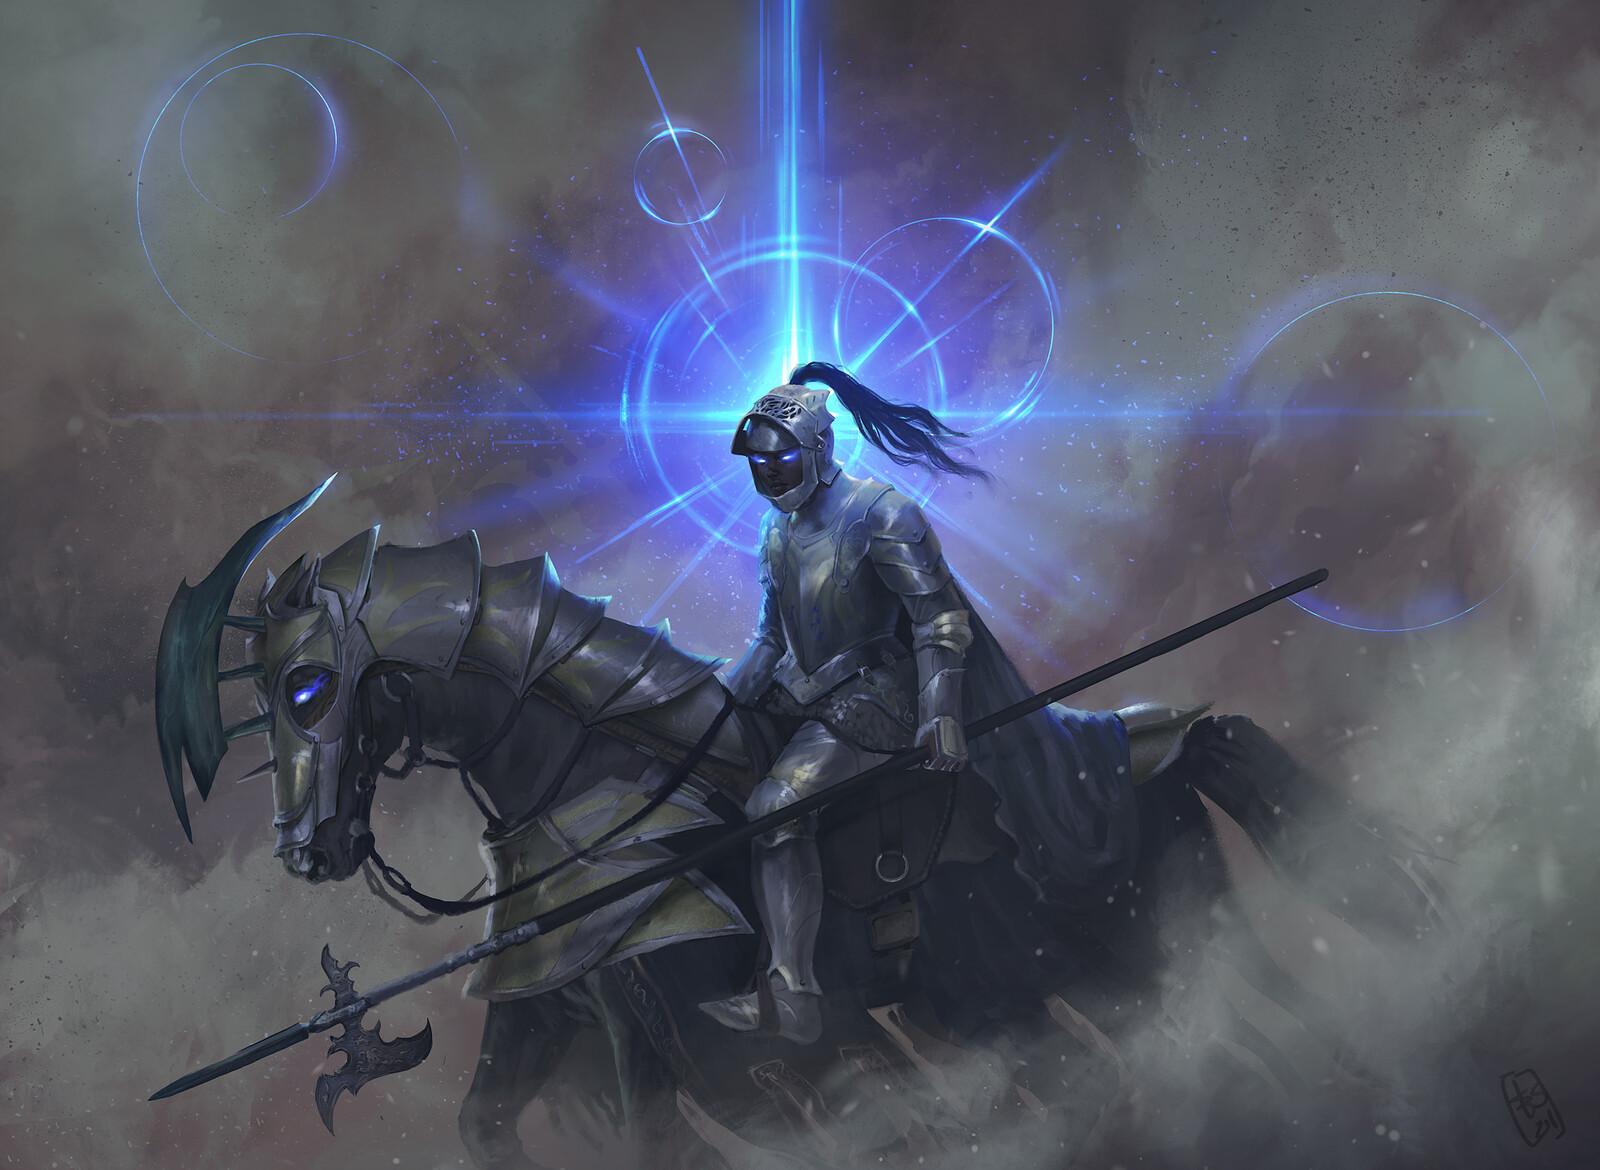 Subservient Knight